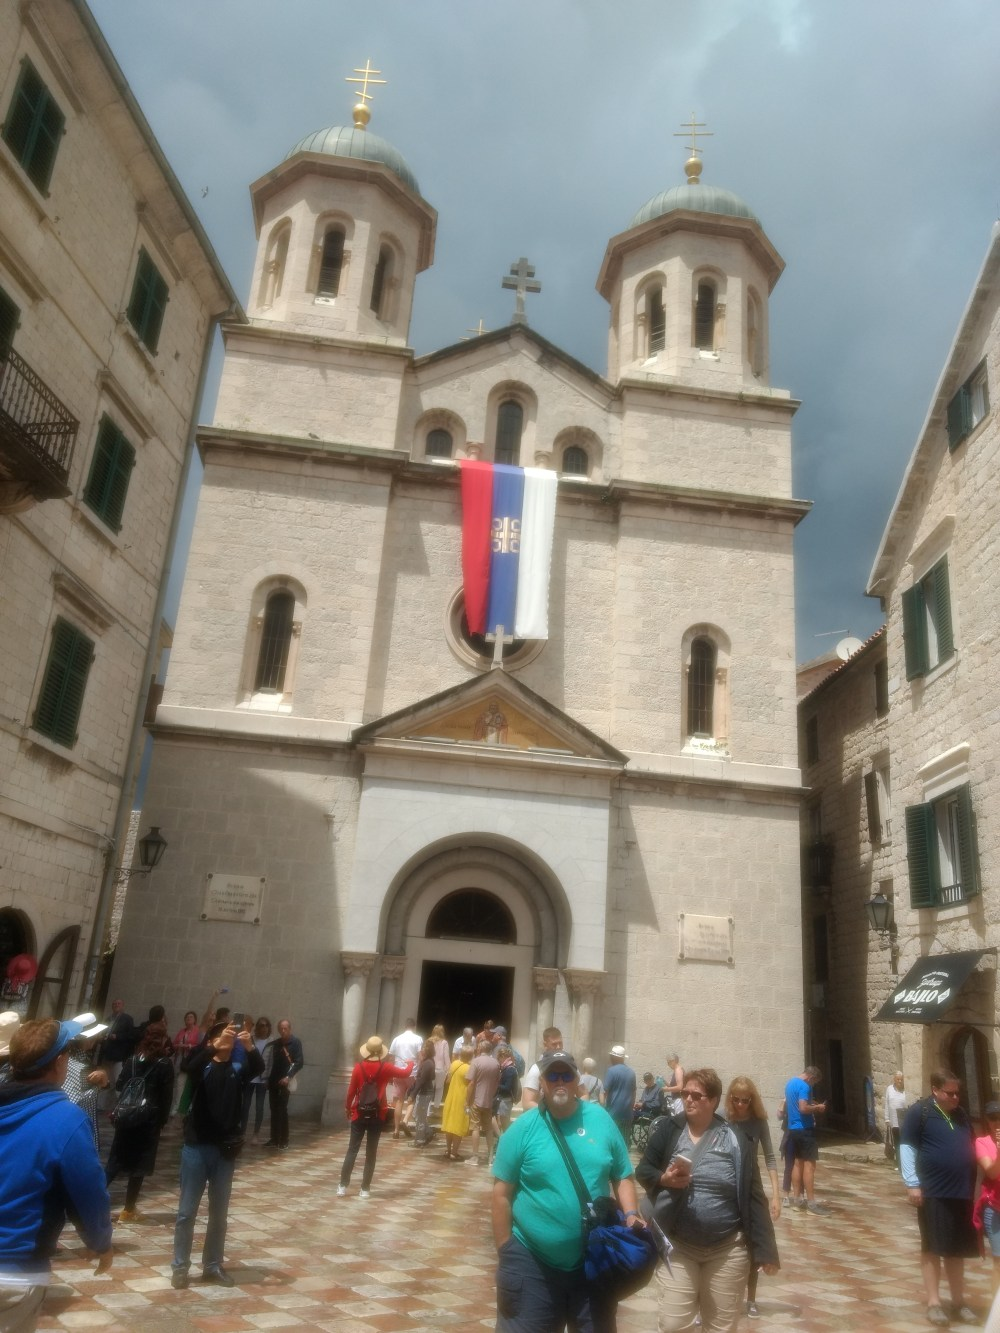 St. Nicholas Church, Old Town, Montenegro, Europe